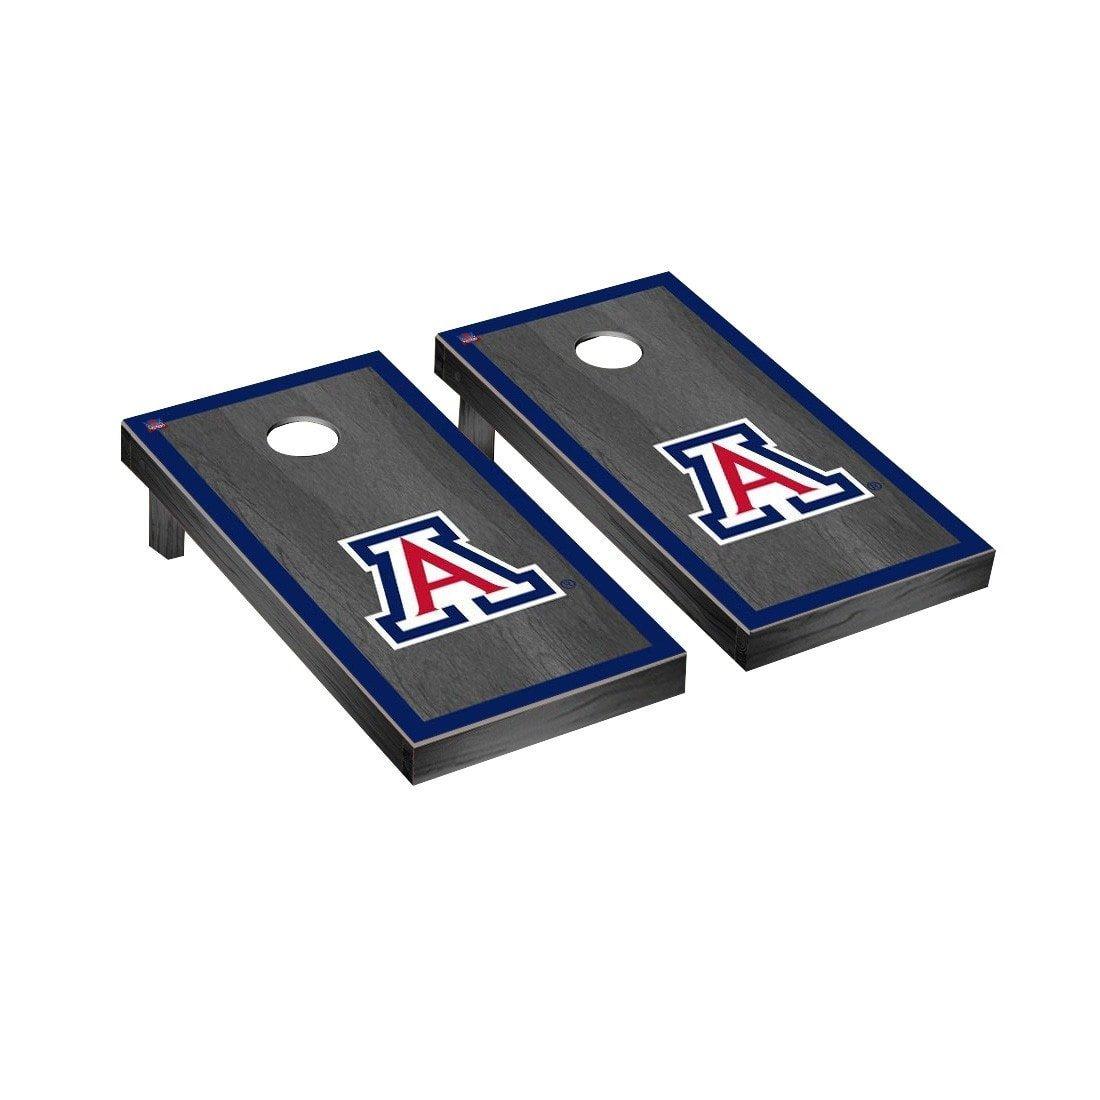 NCAA Cornhole Game Set Color: Onyx, NCAA Team: Arizona Wildcats